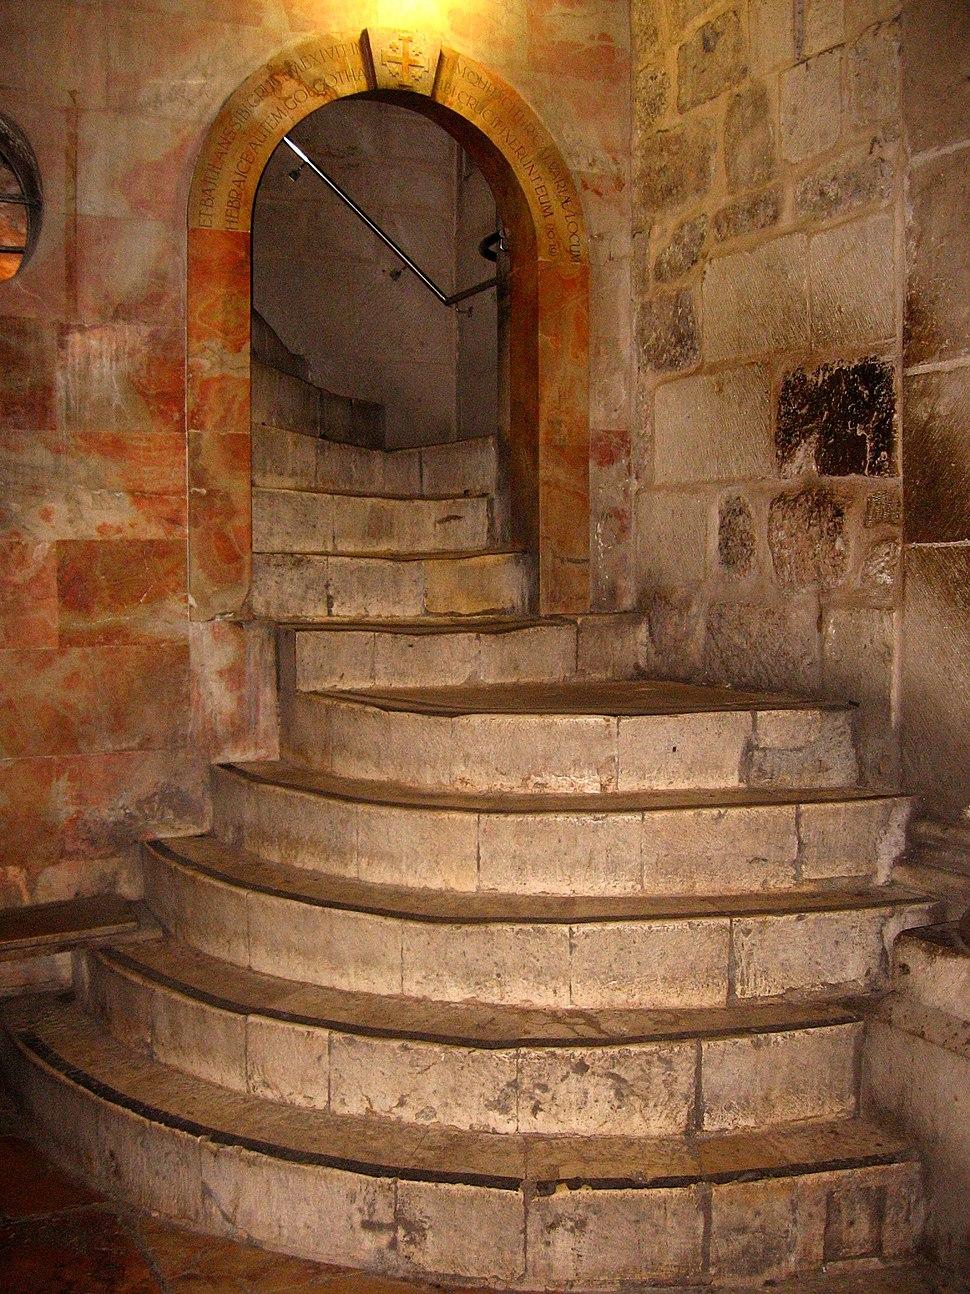 5286-20080123-jerusalem-holy-sepulchre-stairway-golgotha